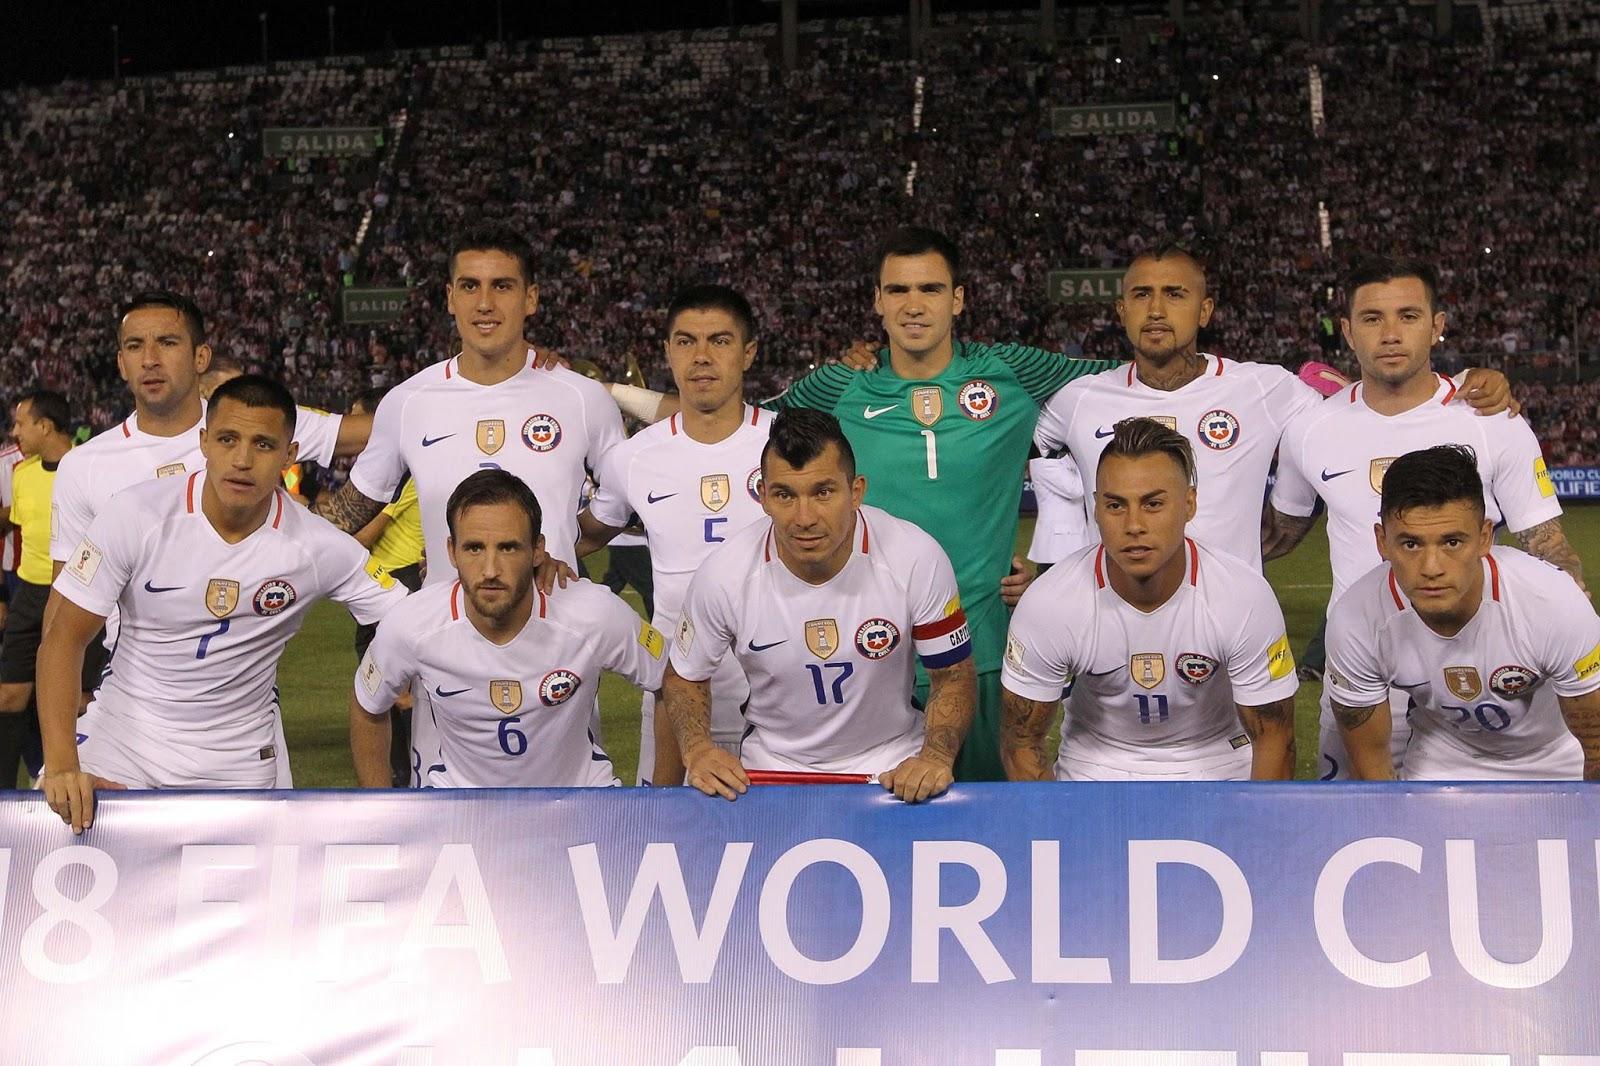 Formación de Chile ante Paraguay, Clasificatorias Rusia 2018, 1 de septiembre de 2016